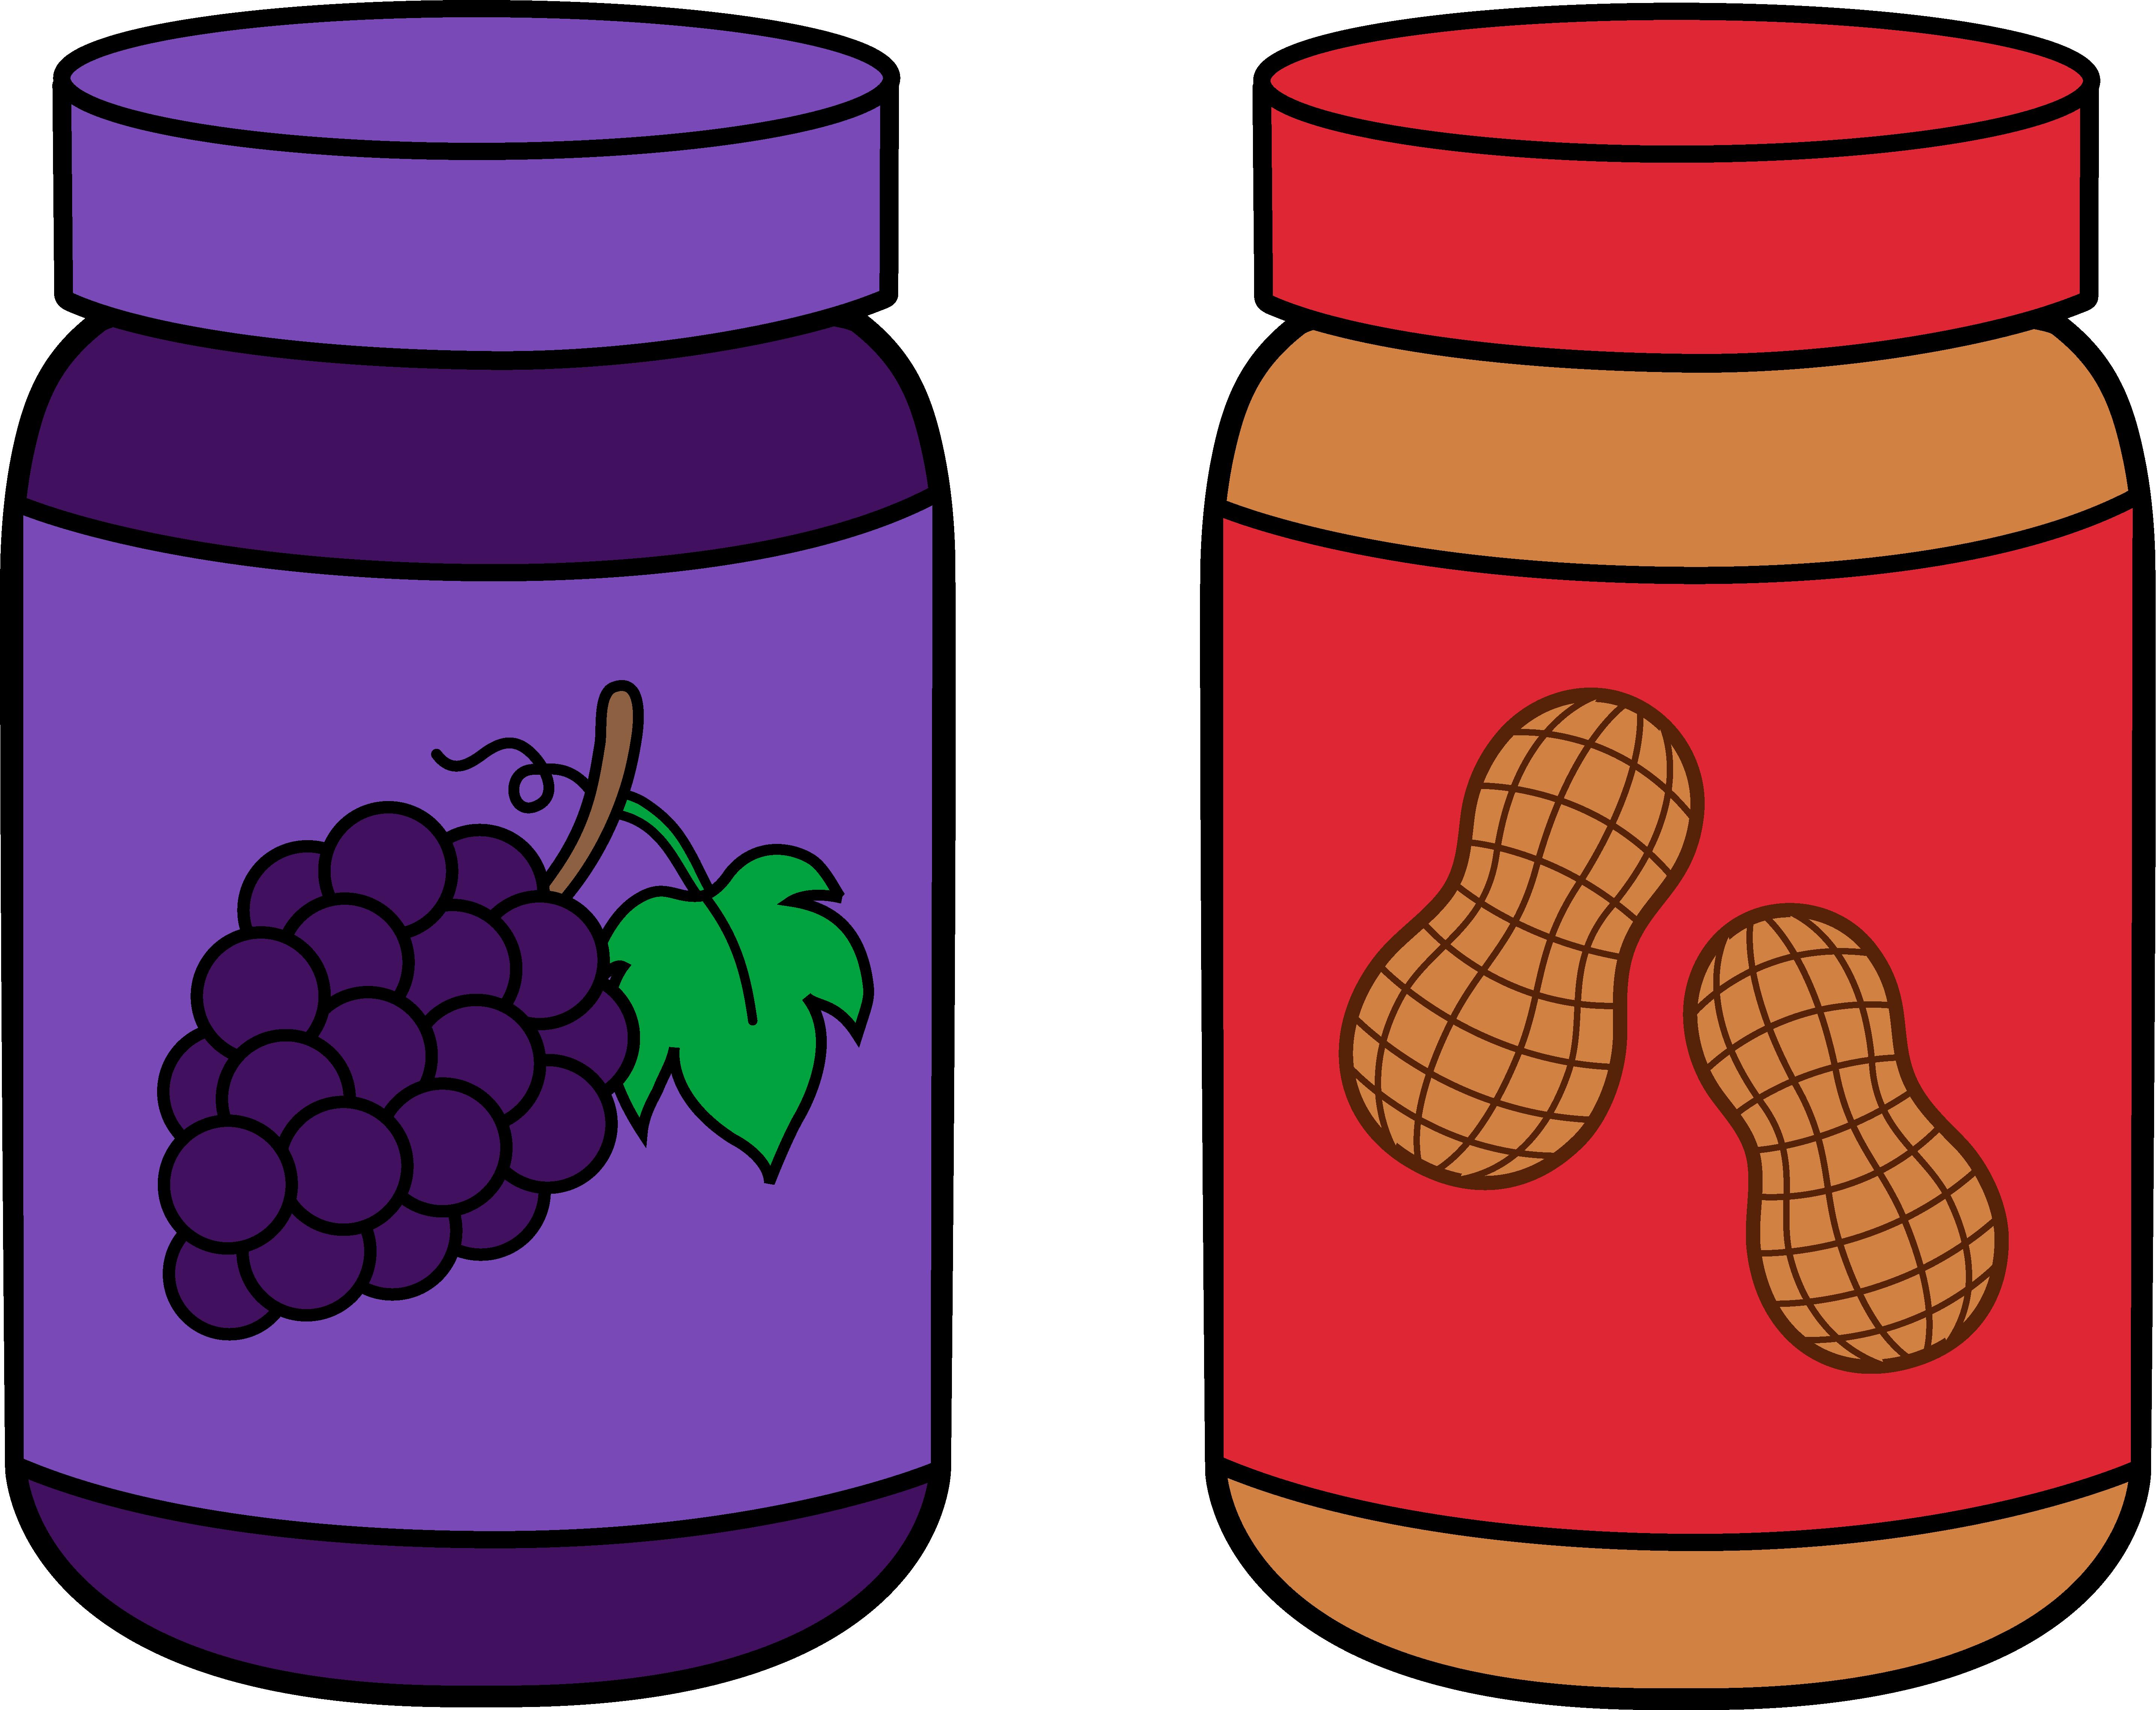 clip stock Peanut butter jar clipart. Drawing storage food